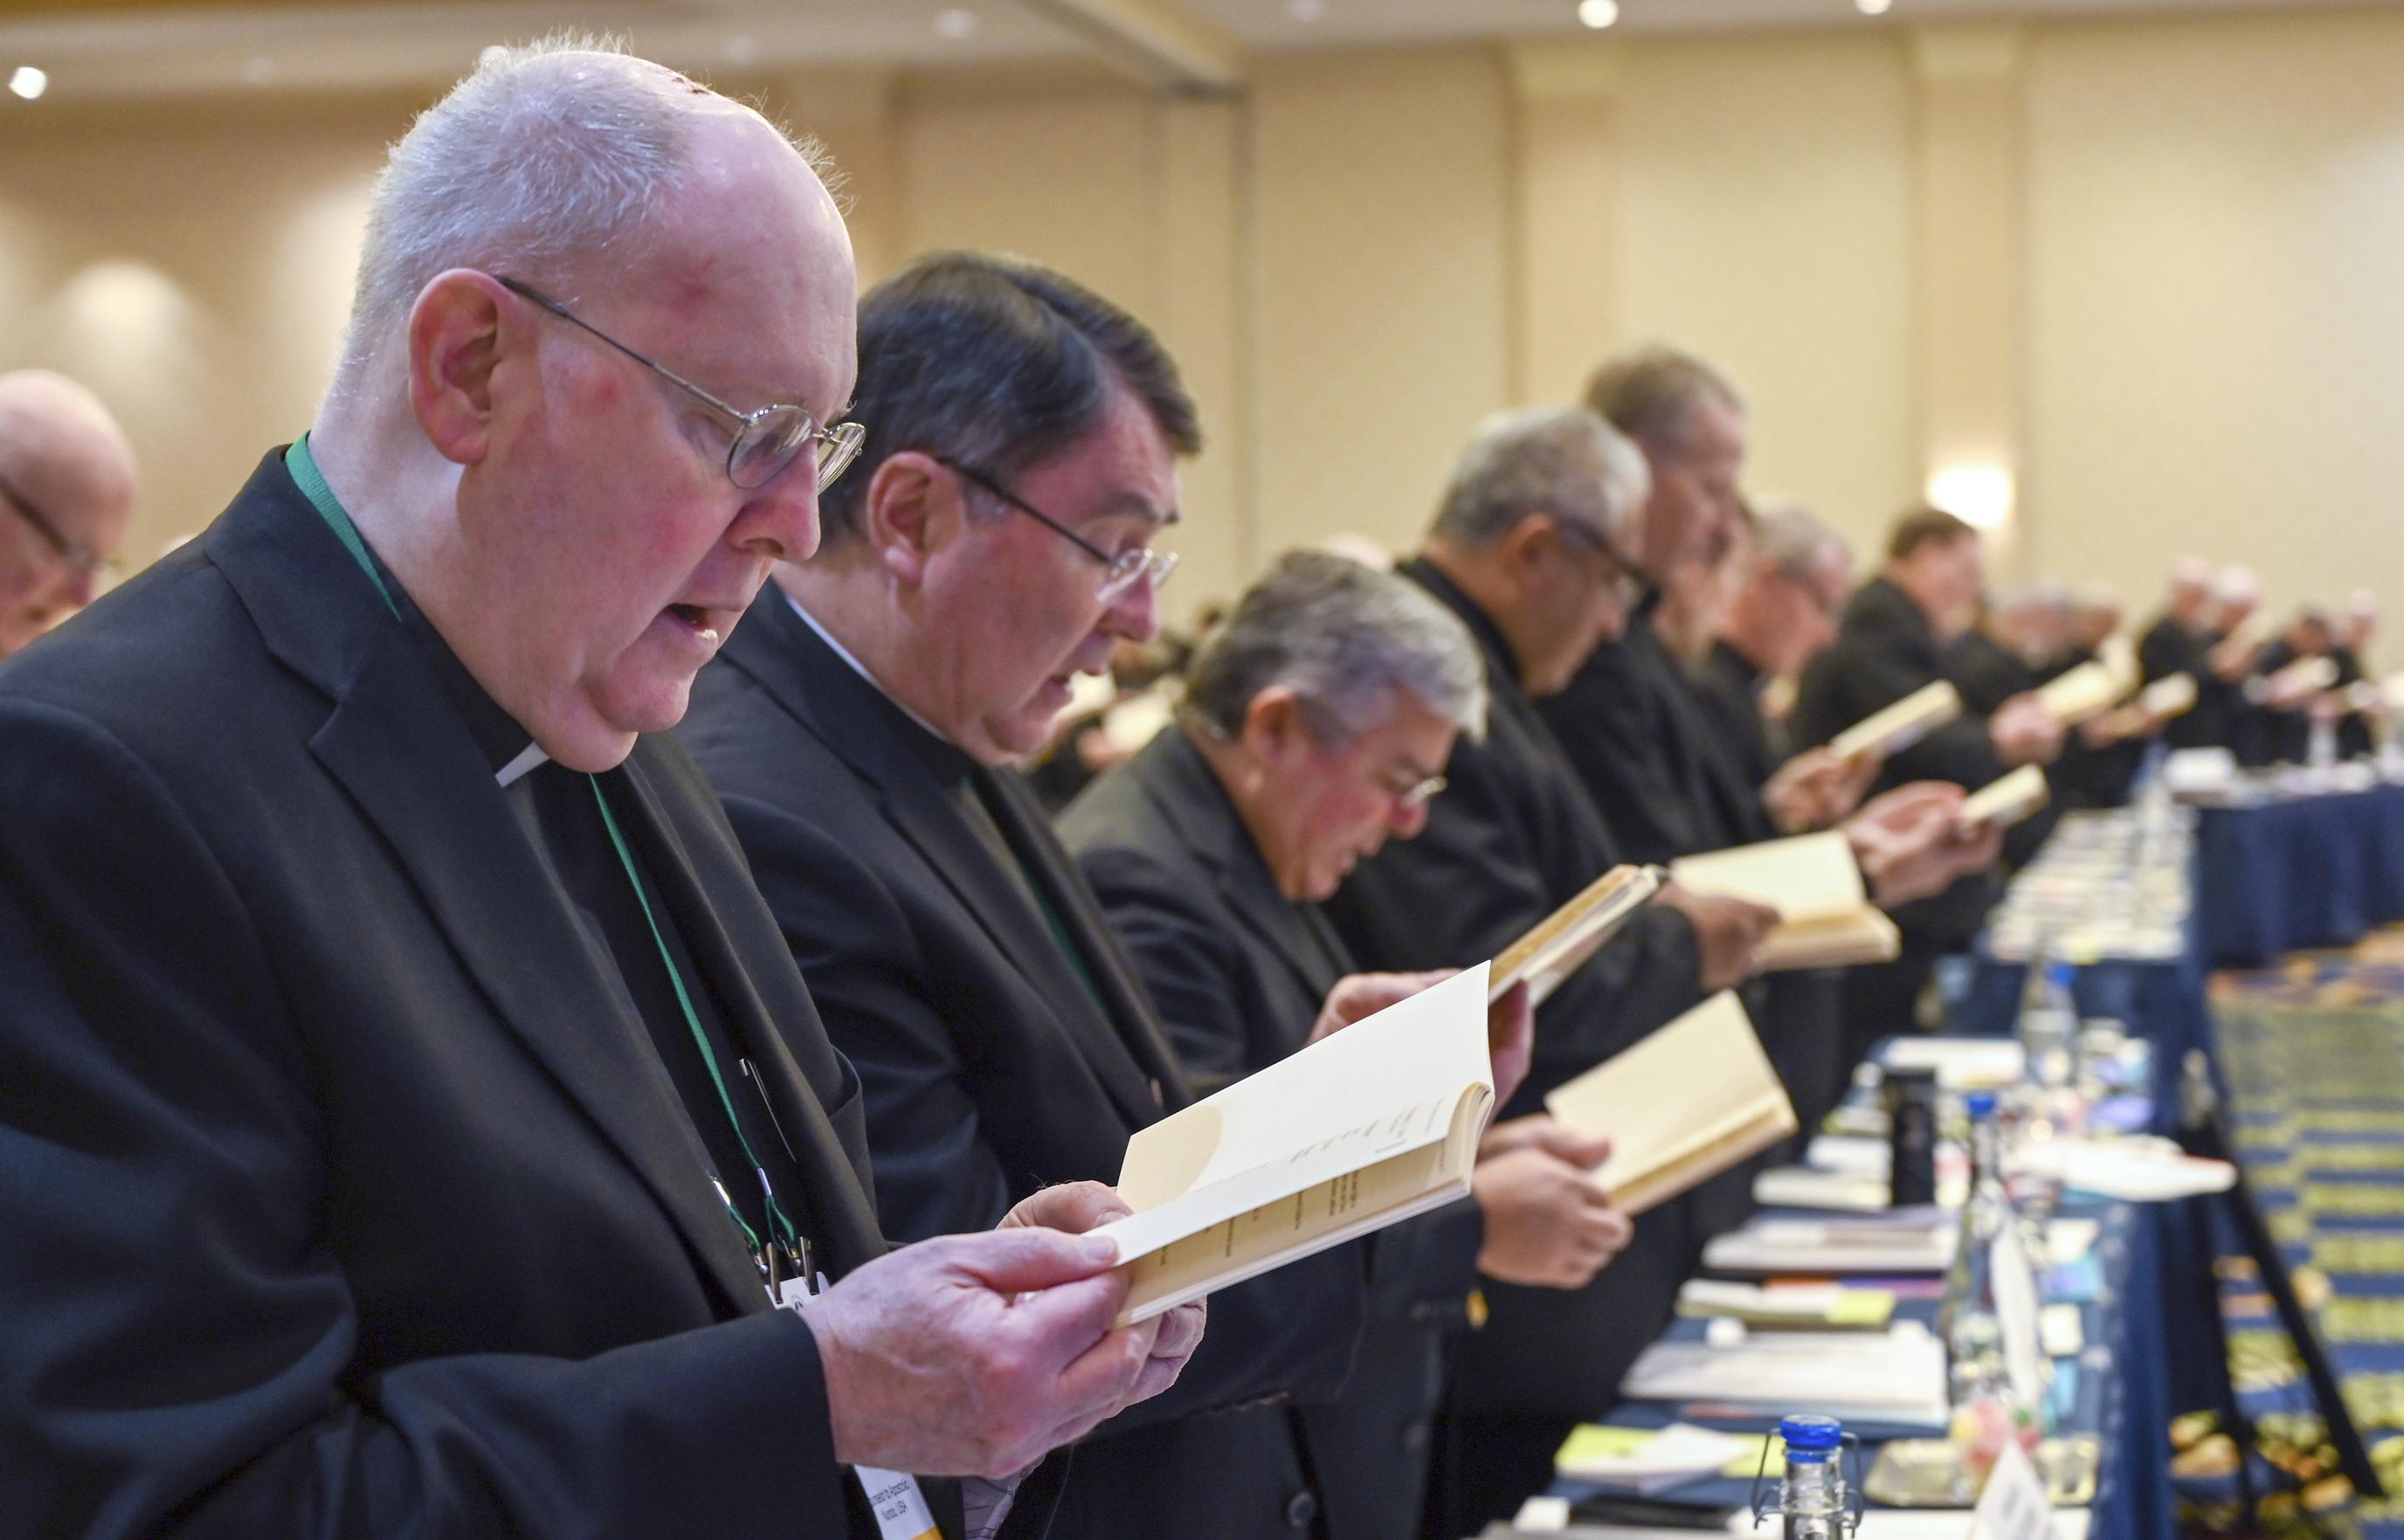 Catholic bishops' agenda: immigrants, gun deaths, sex abuse